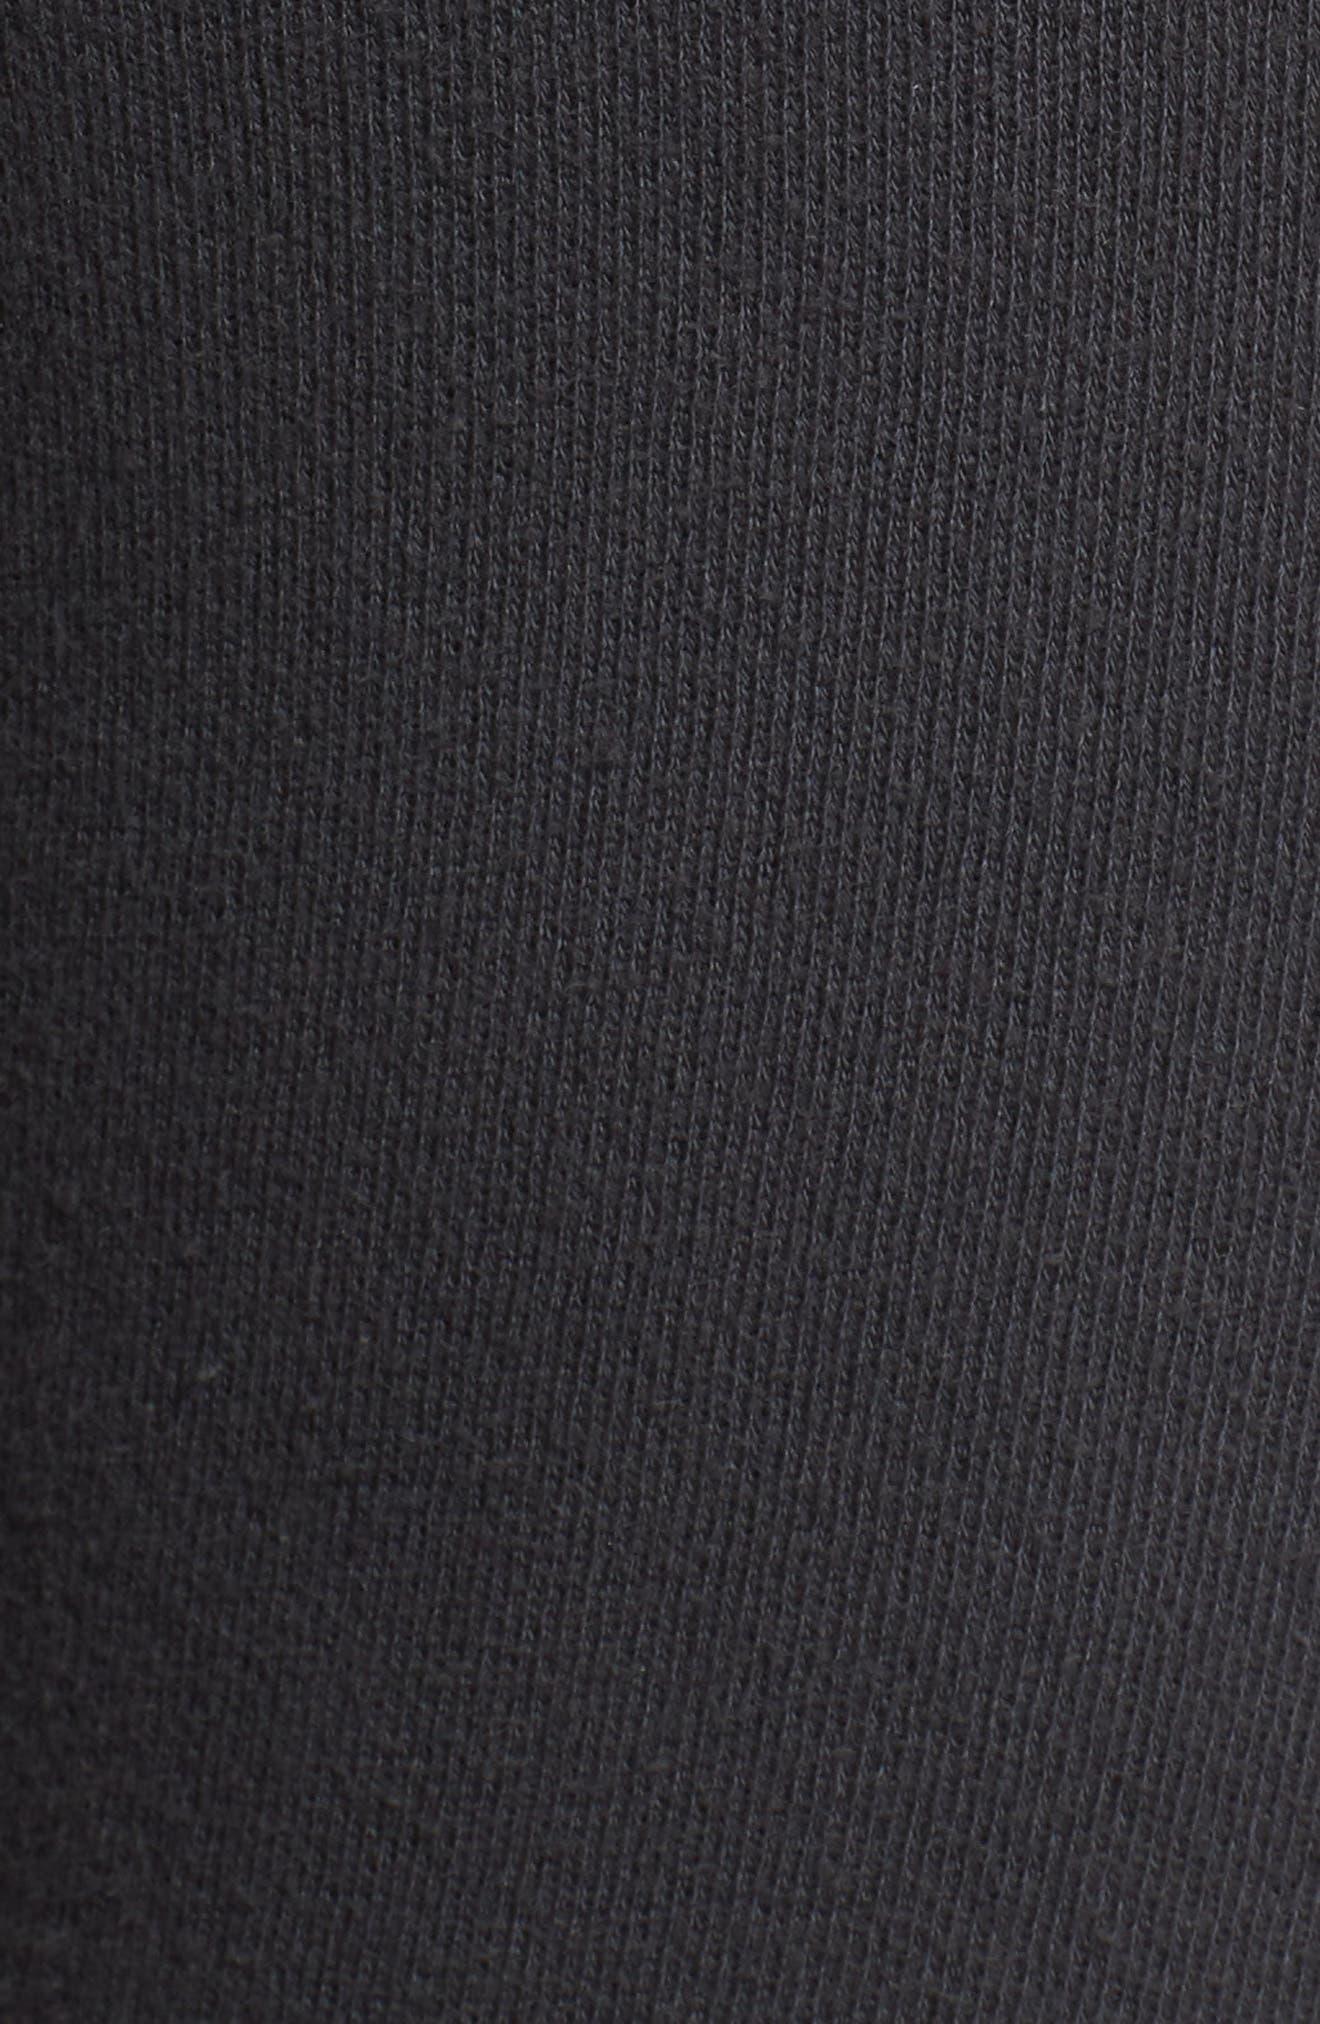 Snoopy Sweatpants,                             Alternate thumbnail 6, color,                             Black